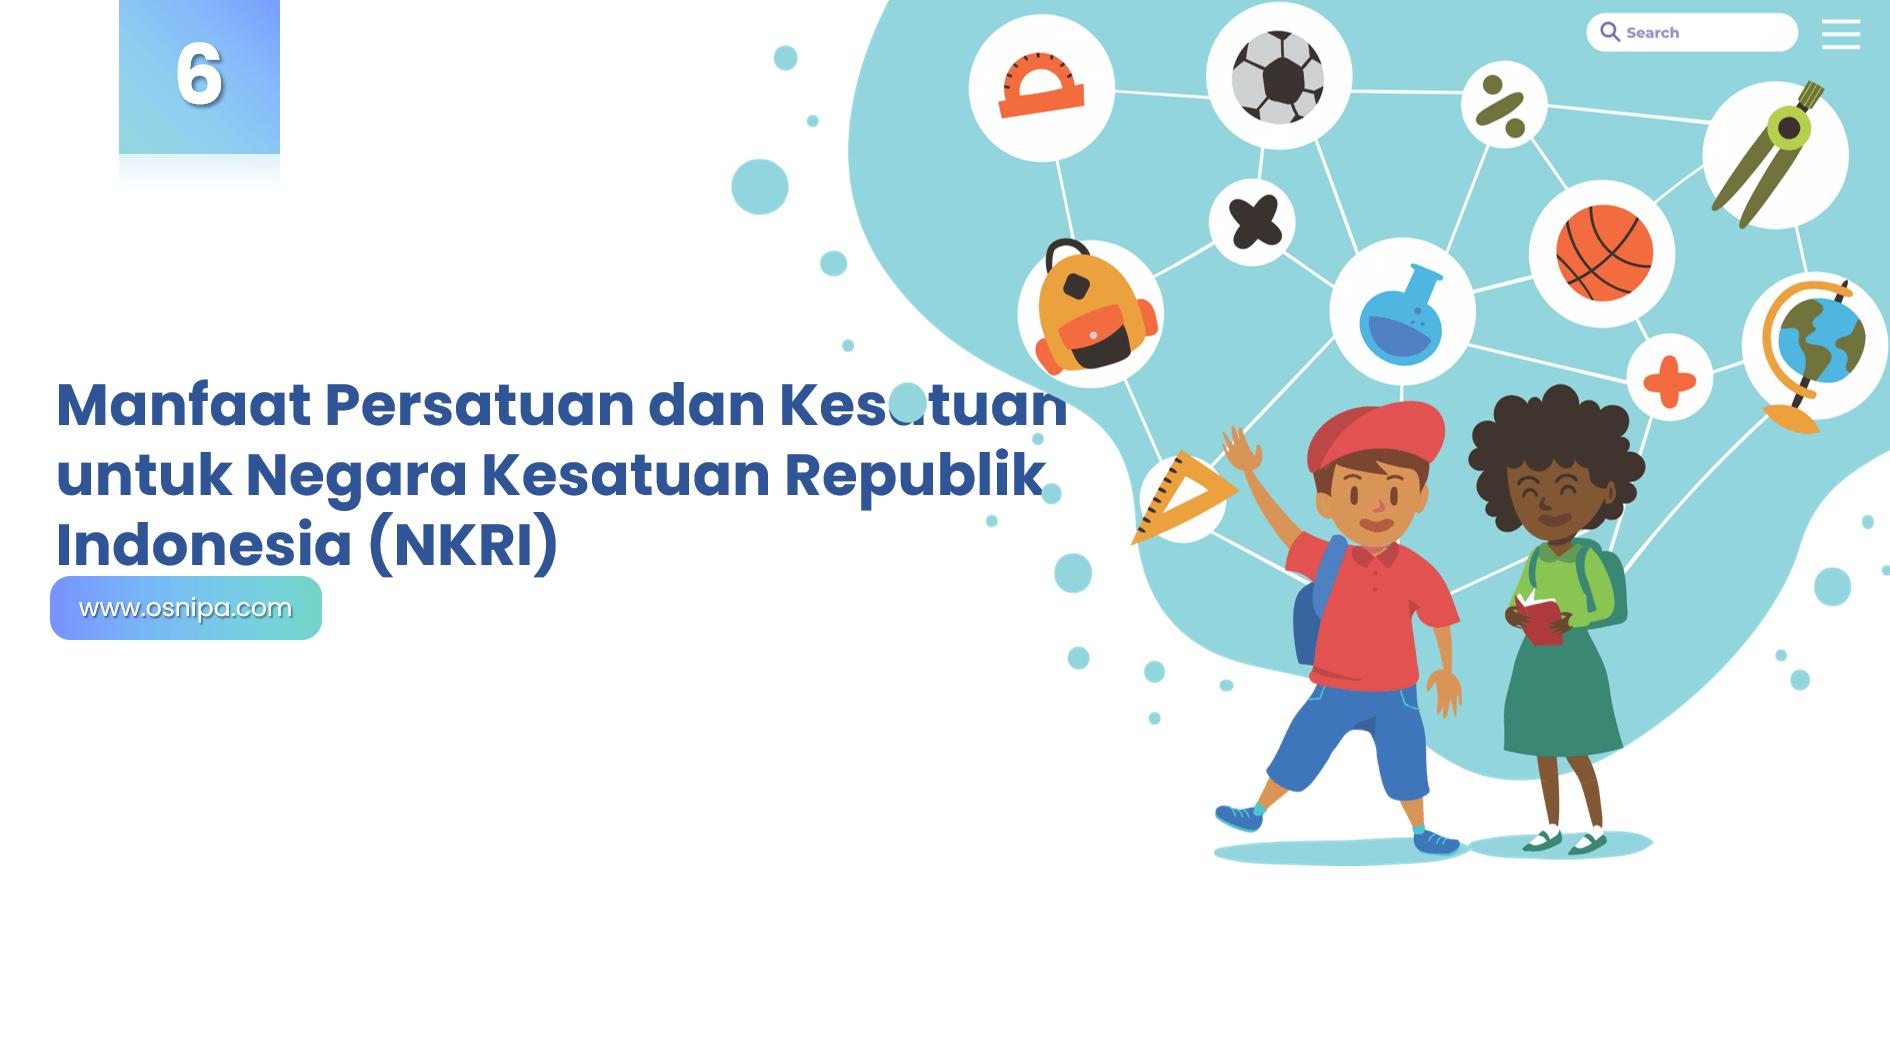 Manfaat Persatuan dan Kesatuan untuk Negara Kesatuan Republik Indonesia (NKRI)